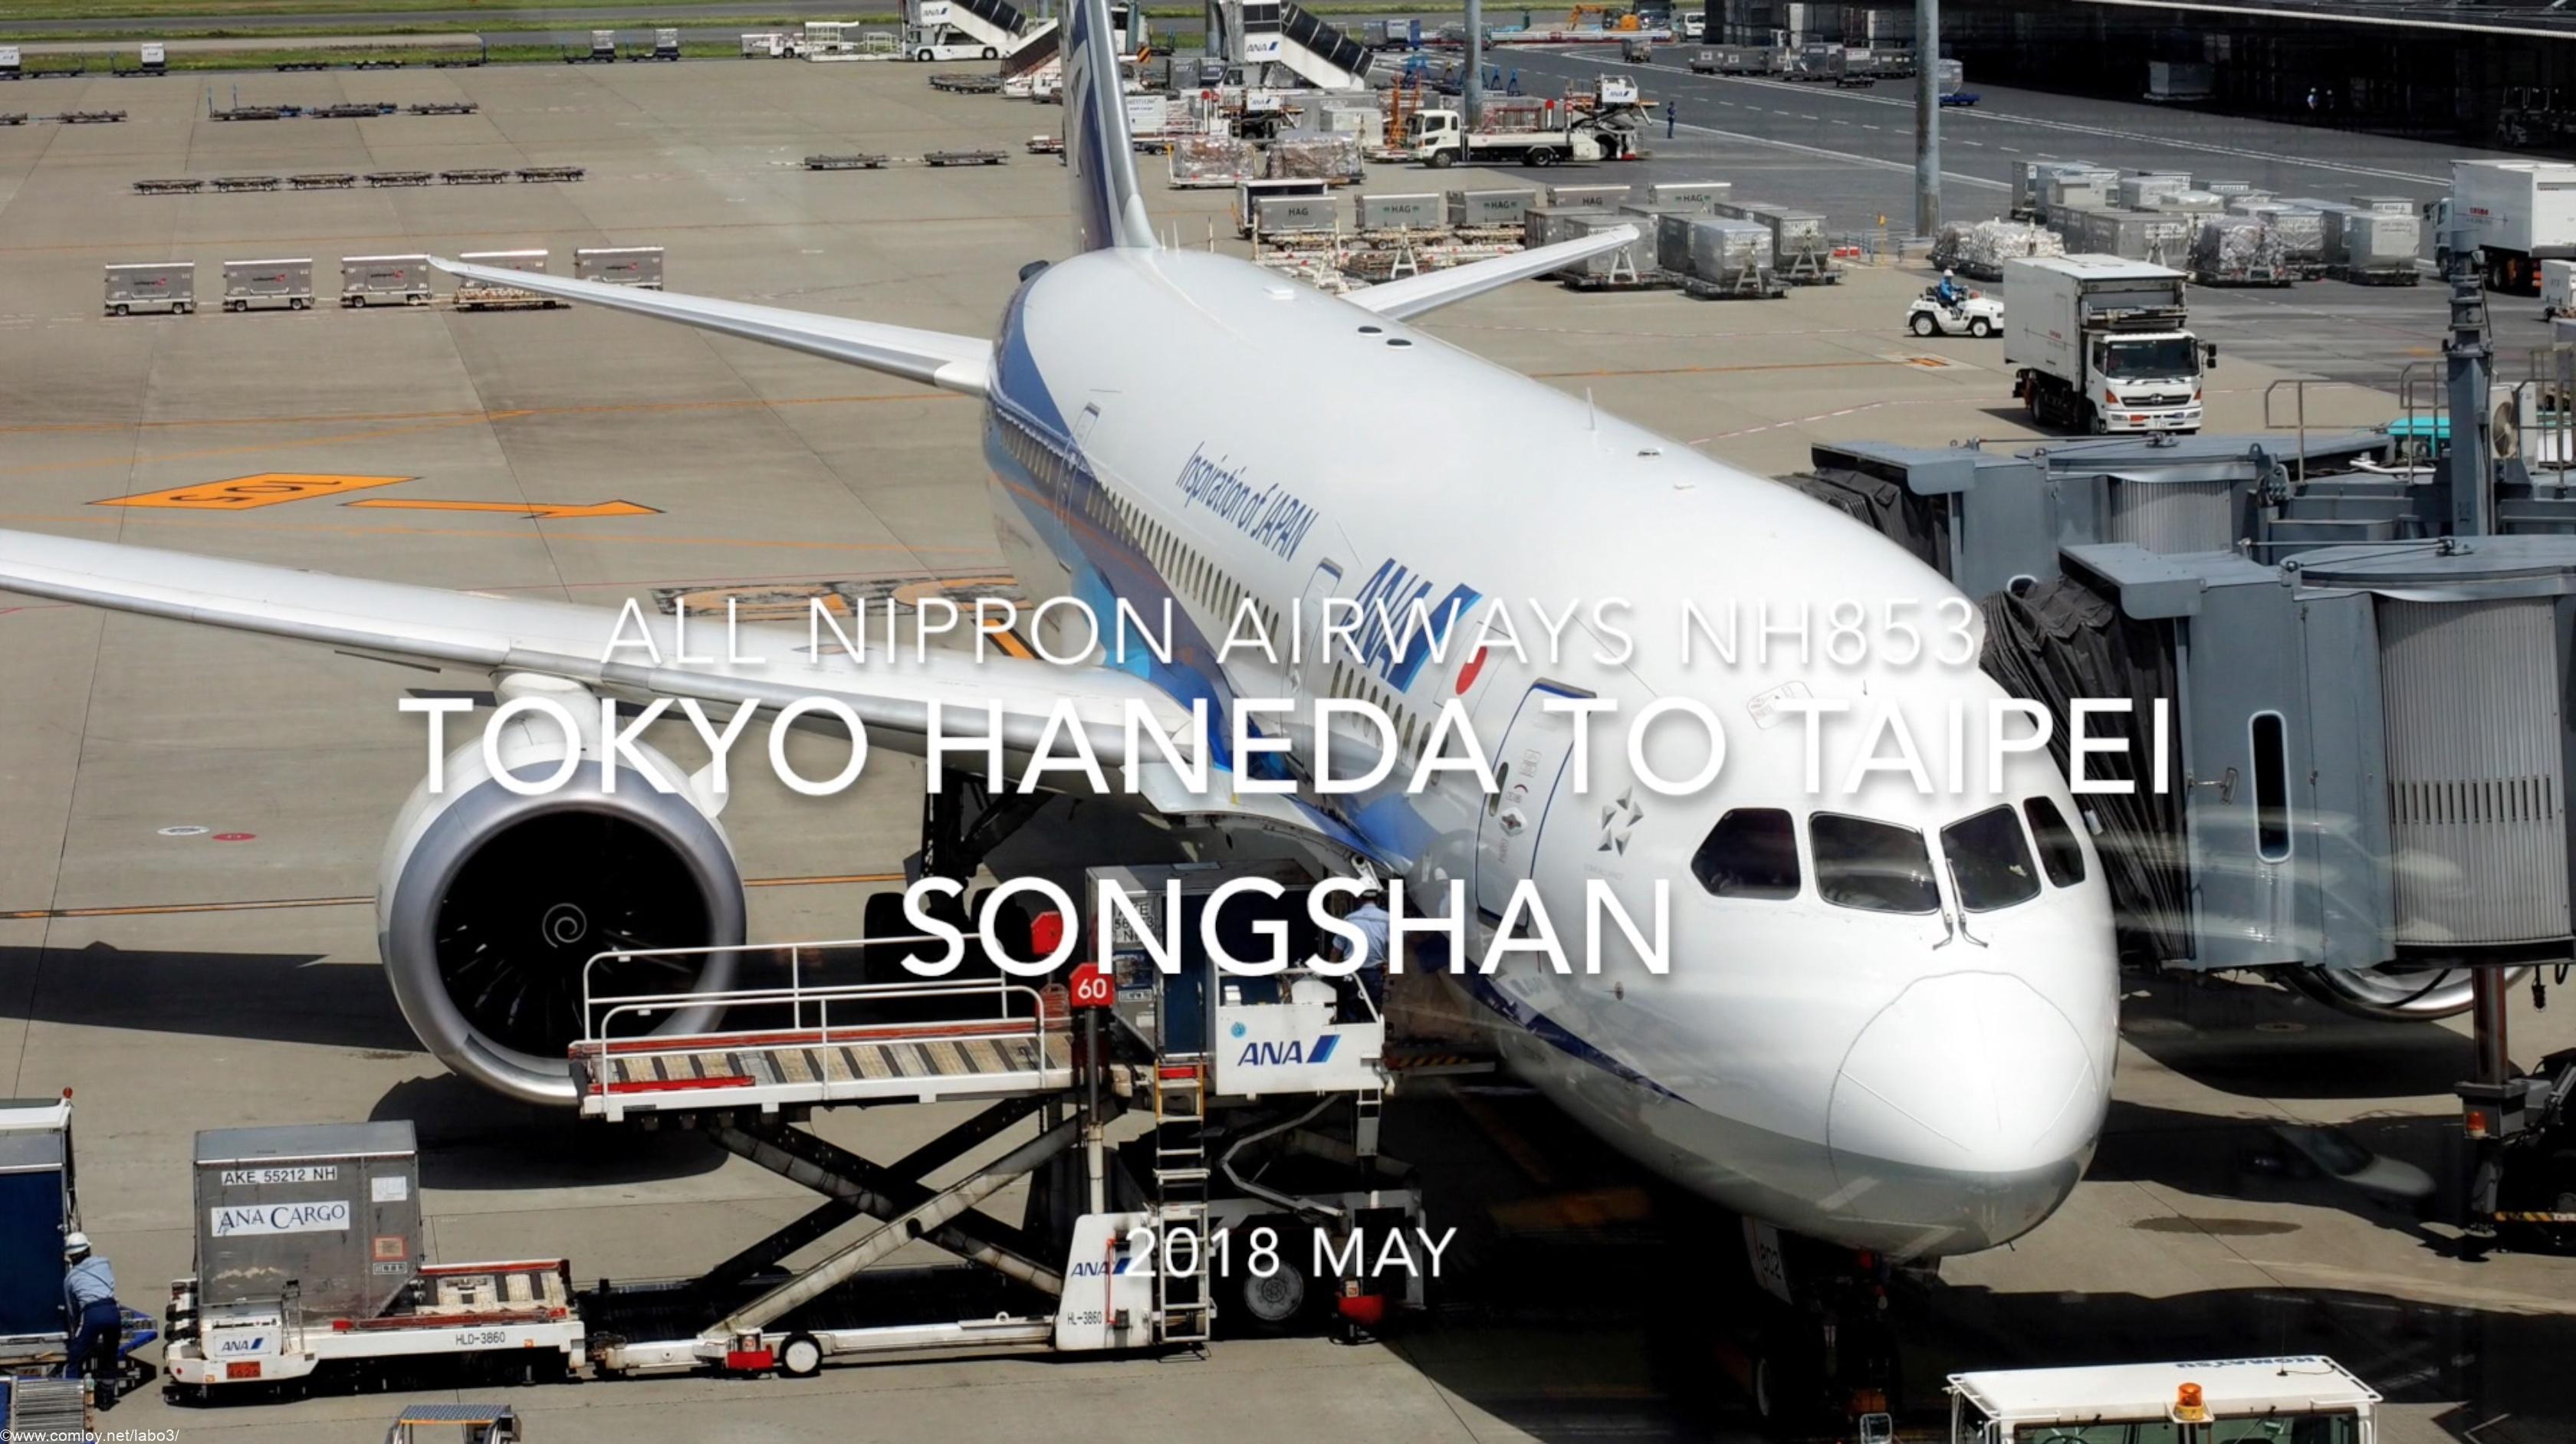 【Flight Report】 All Nippon Airways NH853 TOKYO HANEDA to TAIPEI Songshan 2018 May 全日空 羽田 - 台北 搭乗記